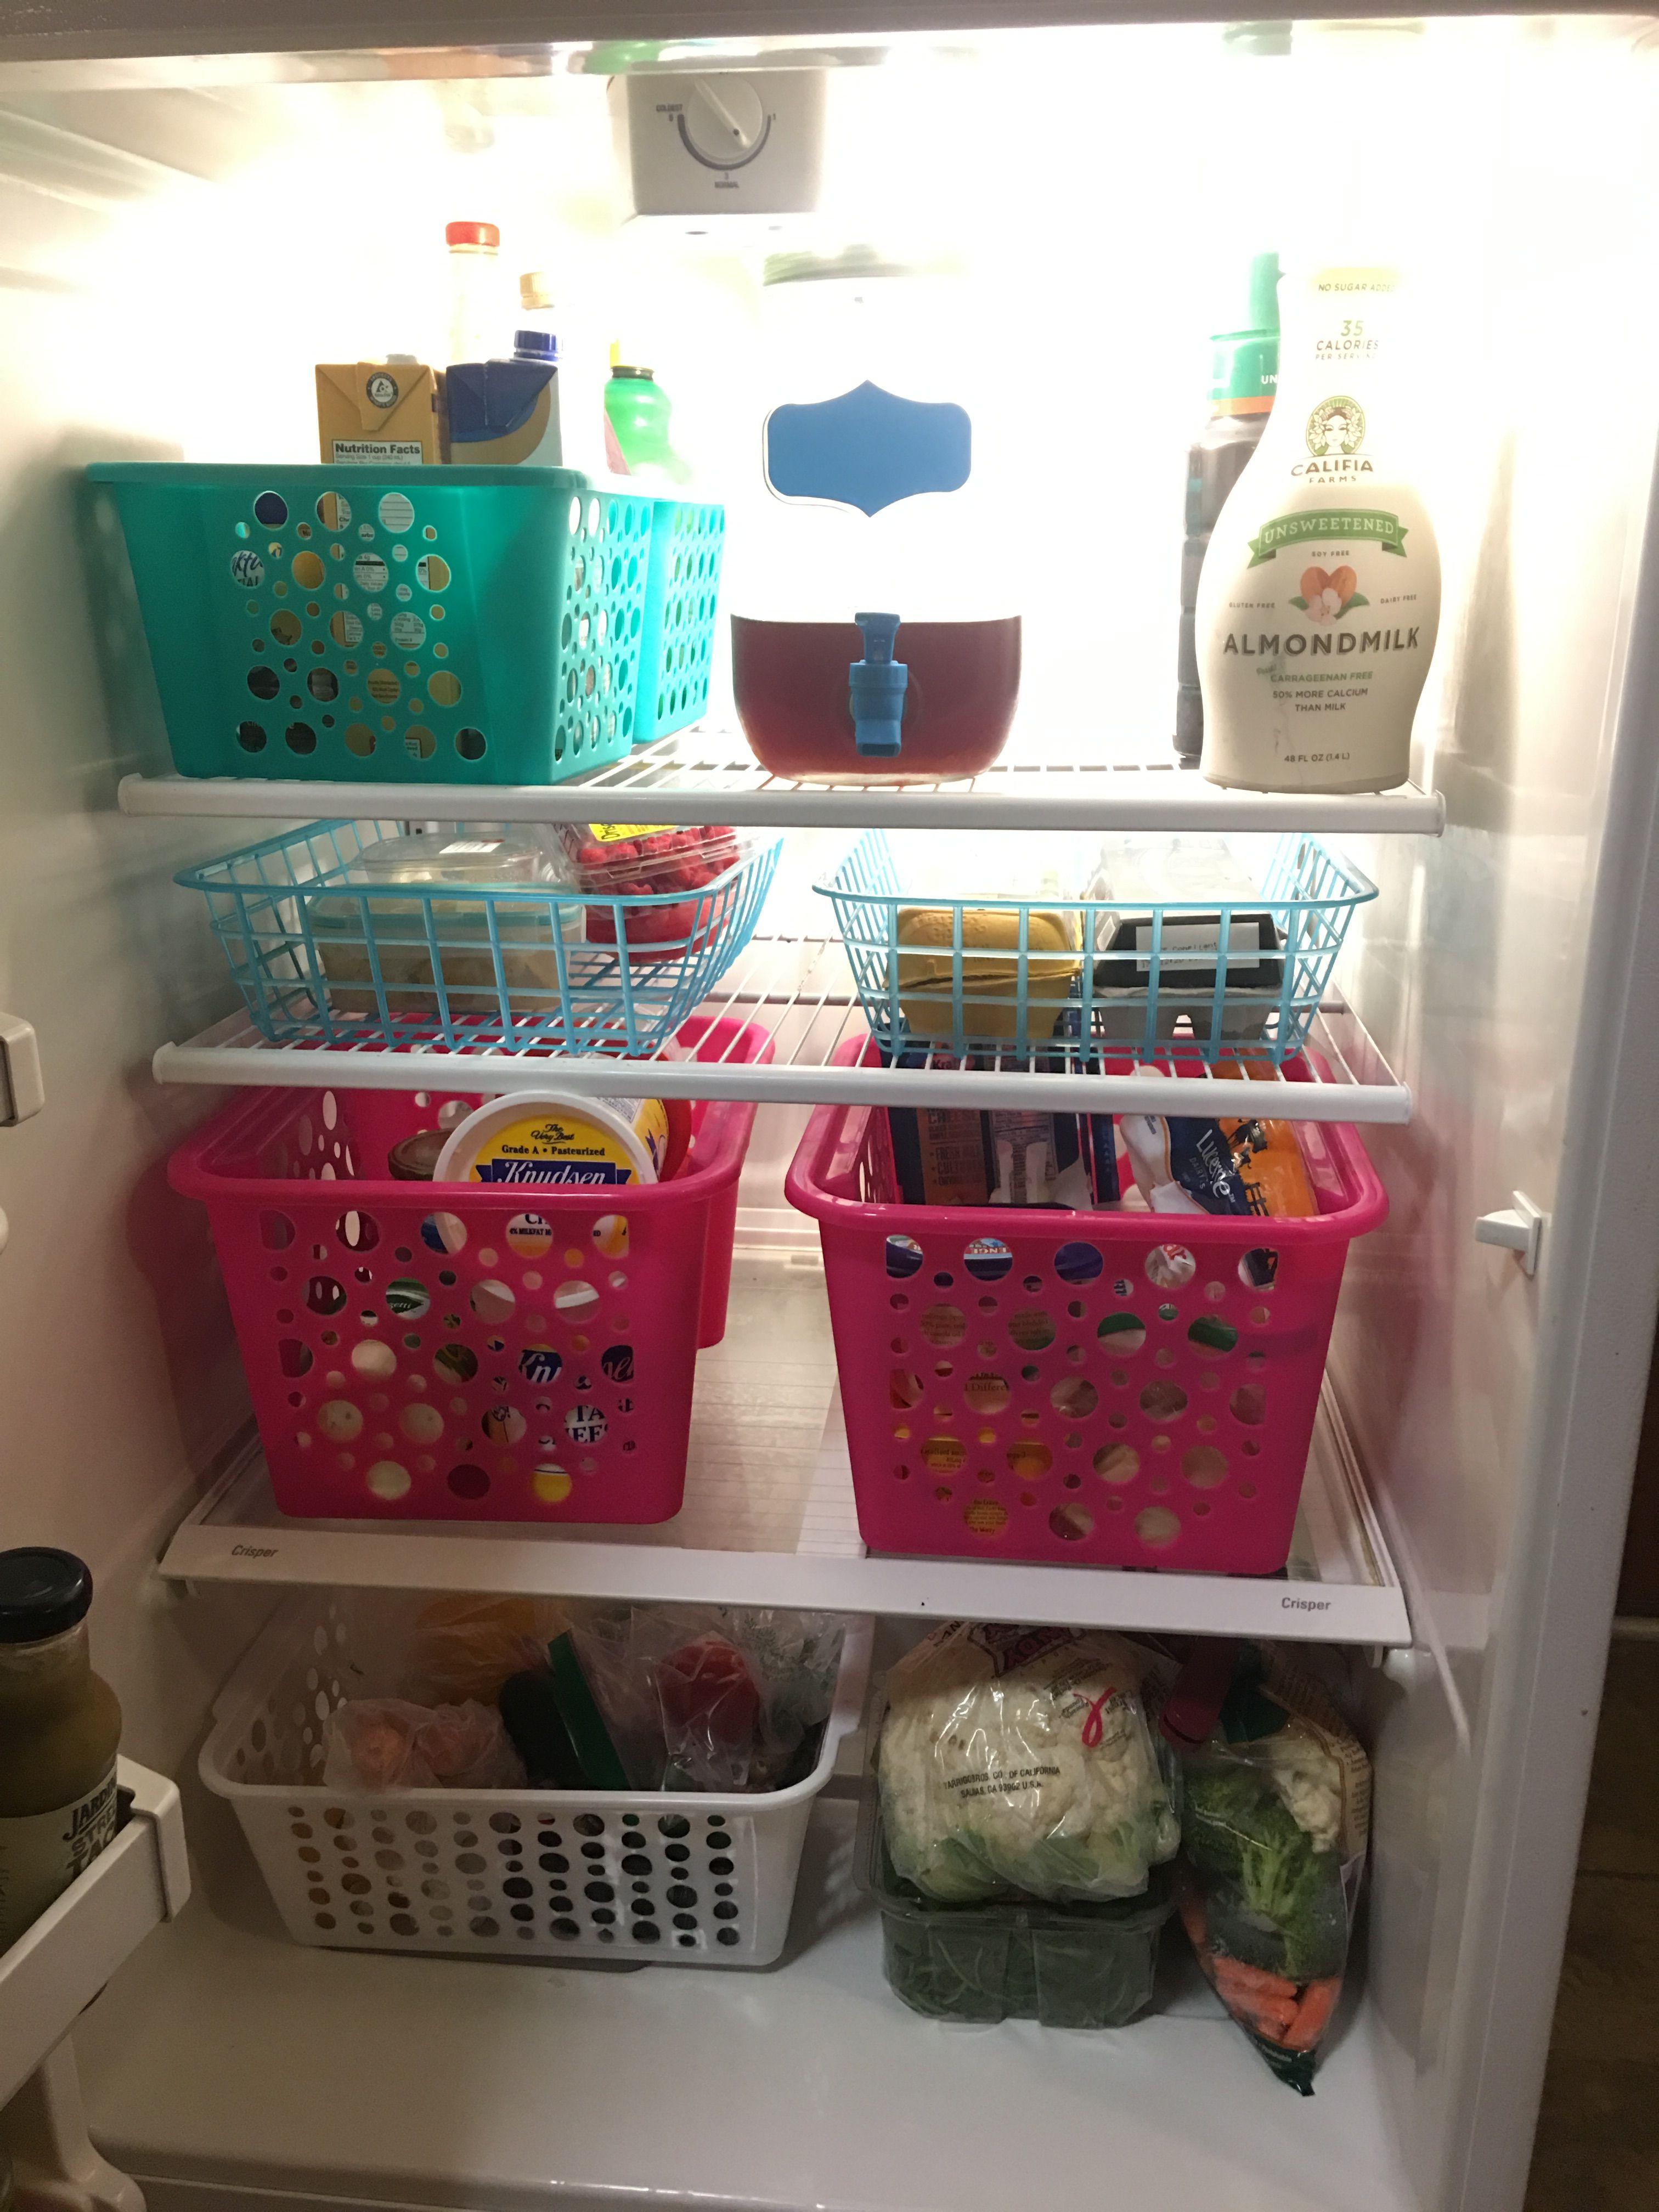 Fridge Organization Dollar Tree Baskets Fridge Organization Dollar Tree Baskets Freezer Organization